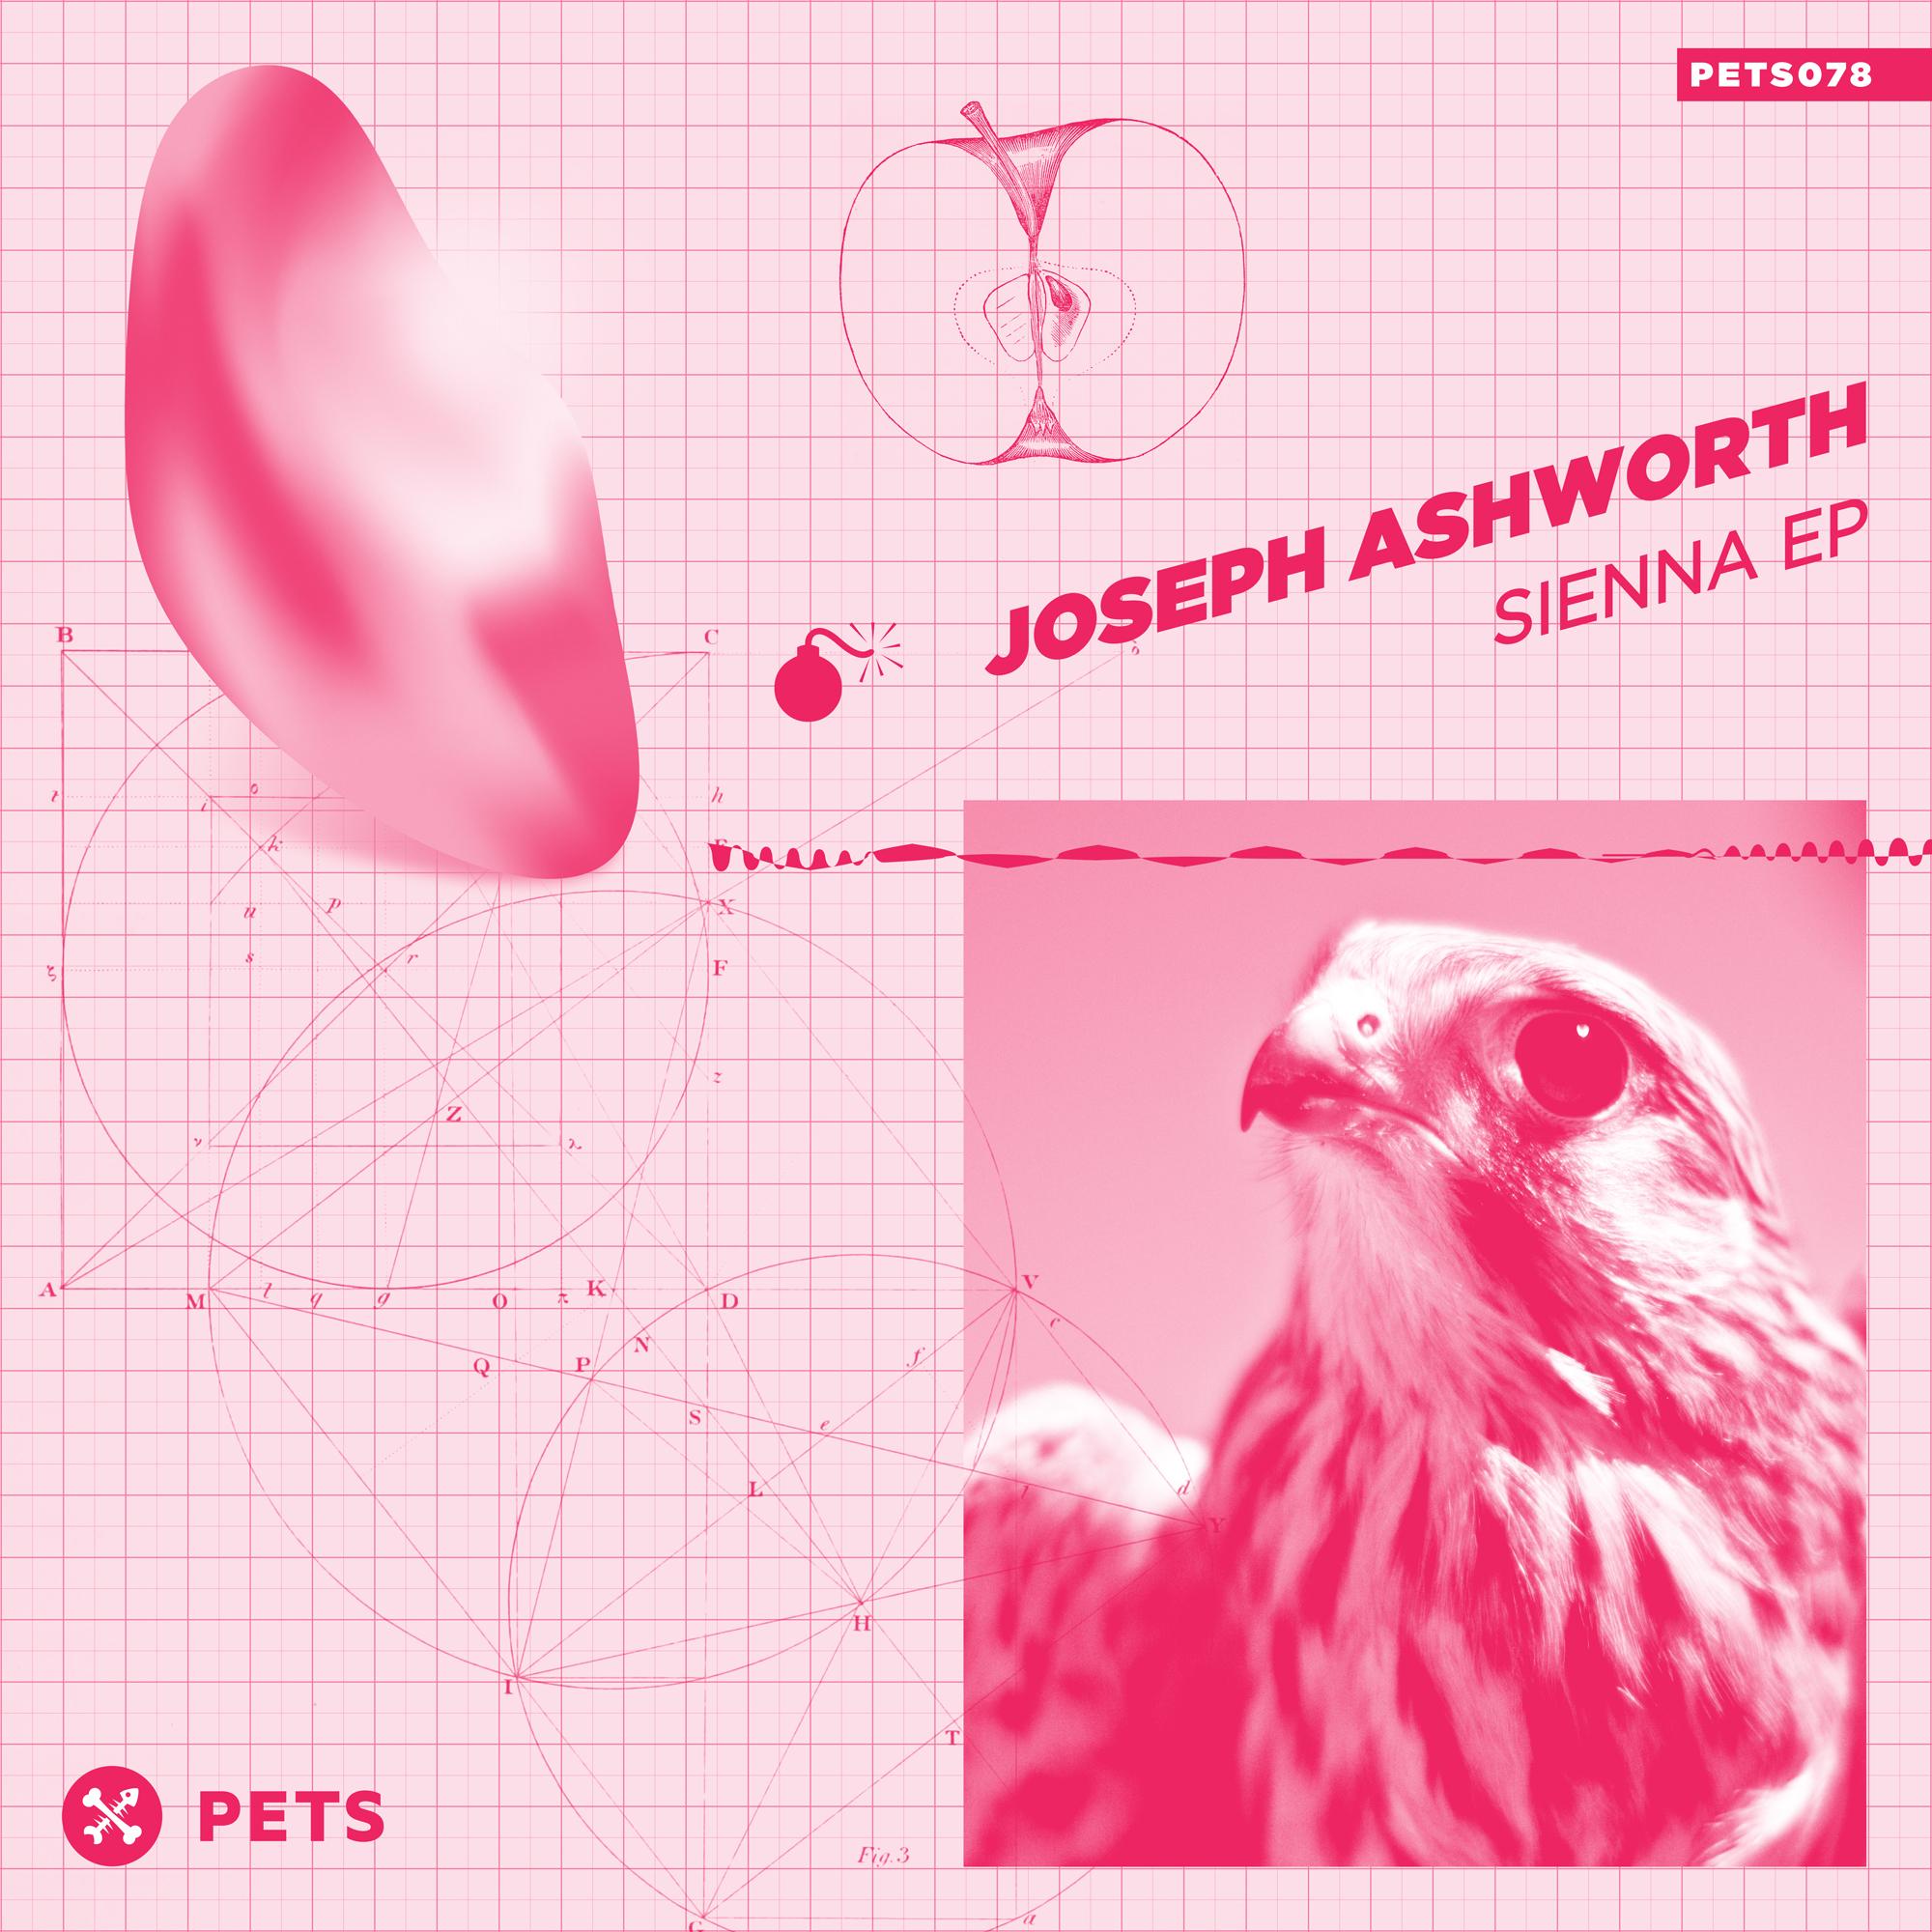 Joseph Ashworth - Sienna EP